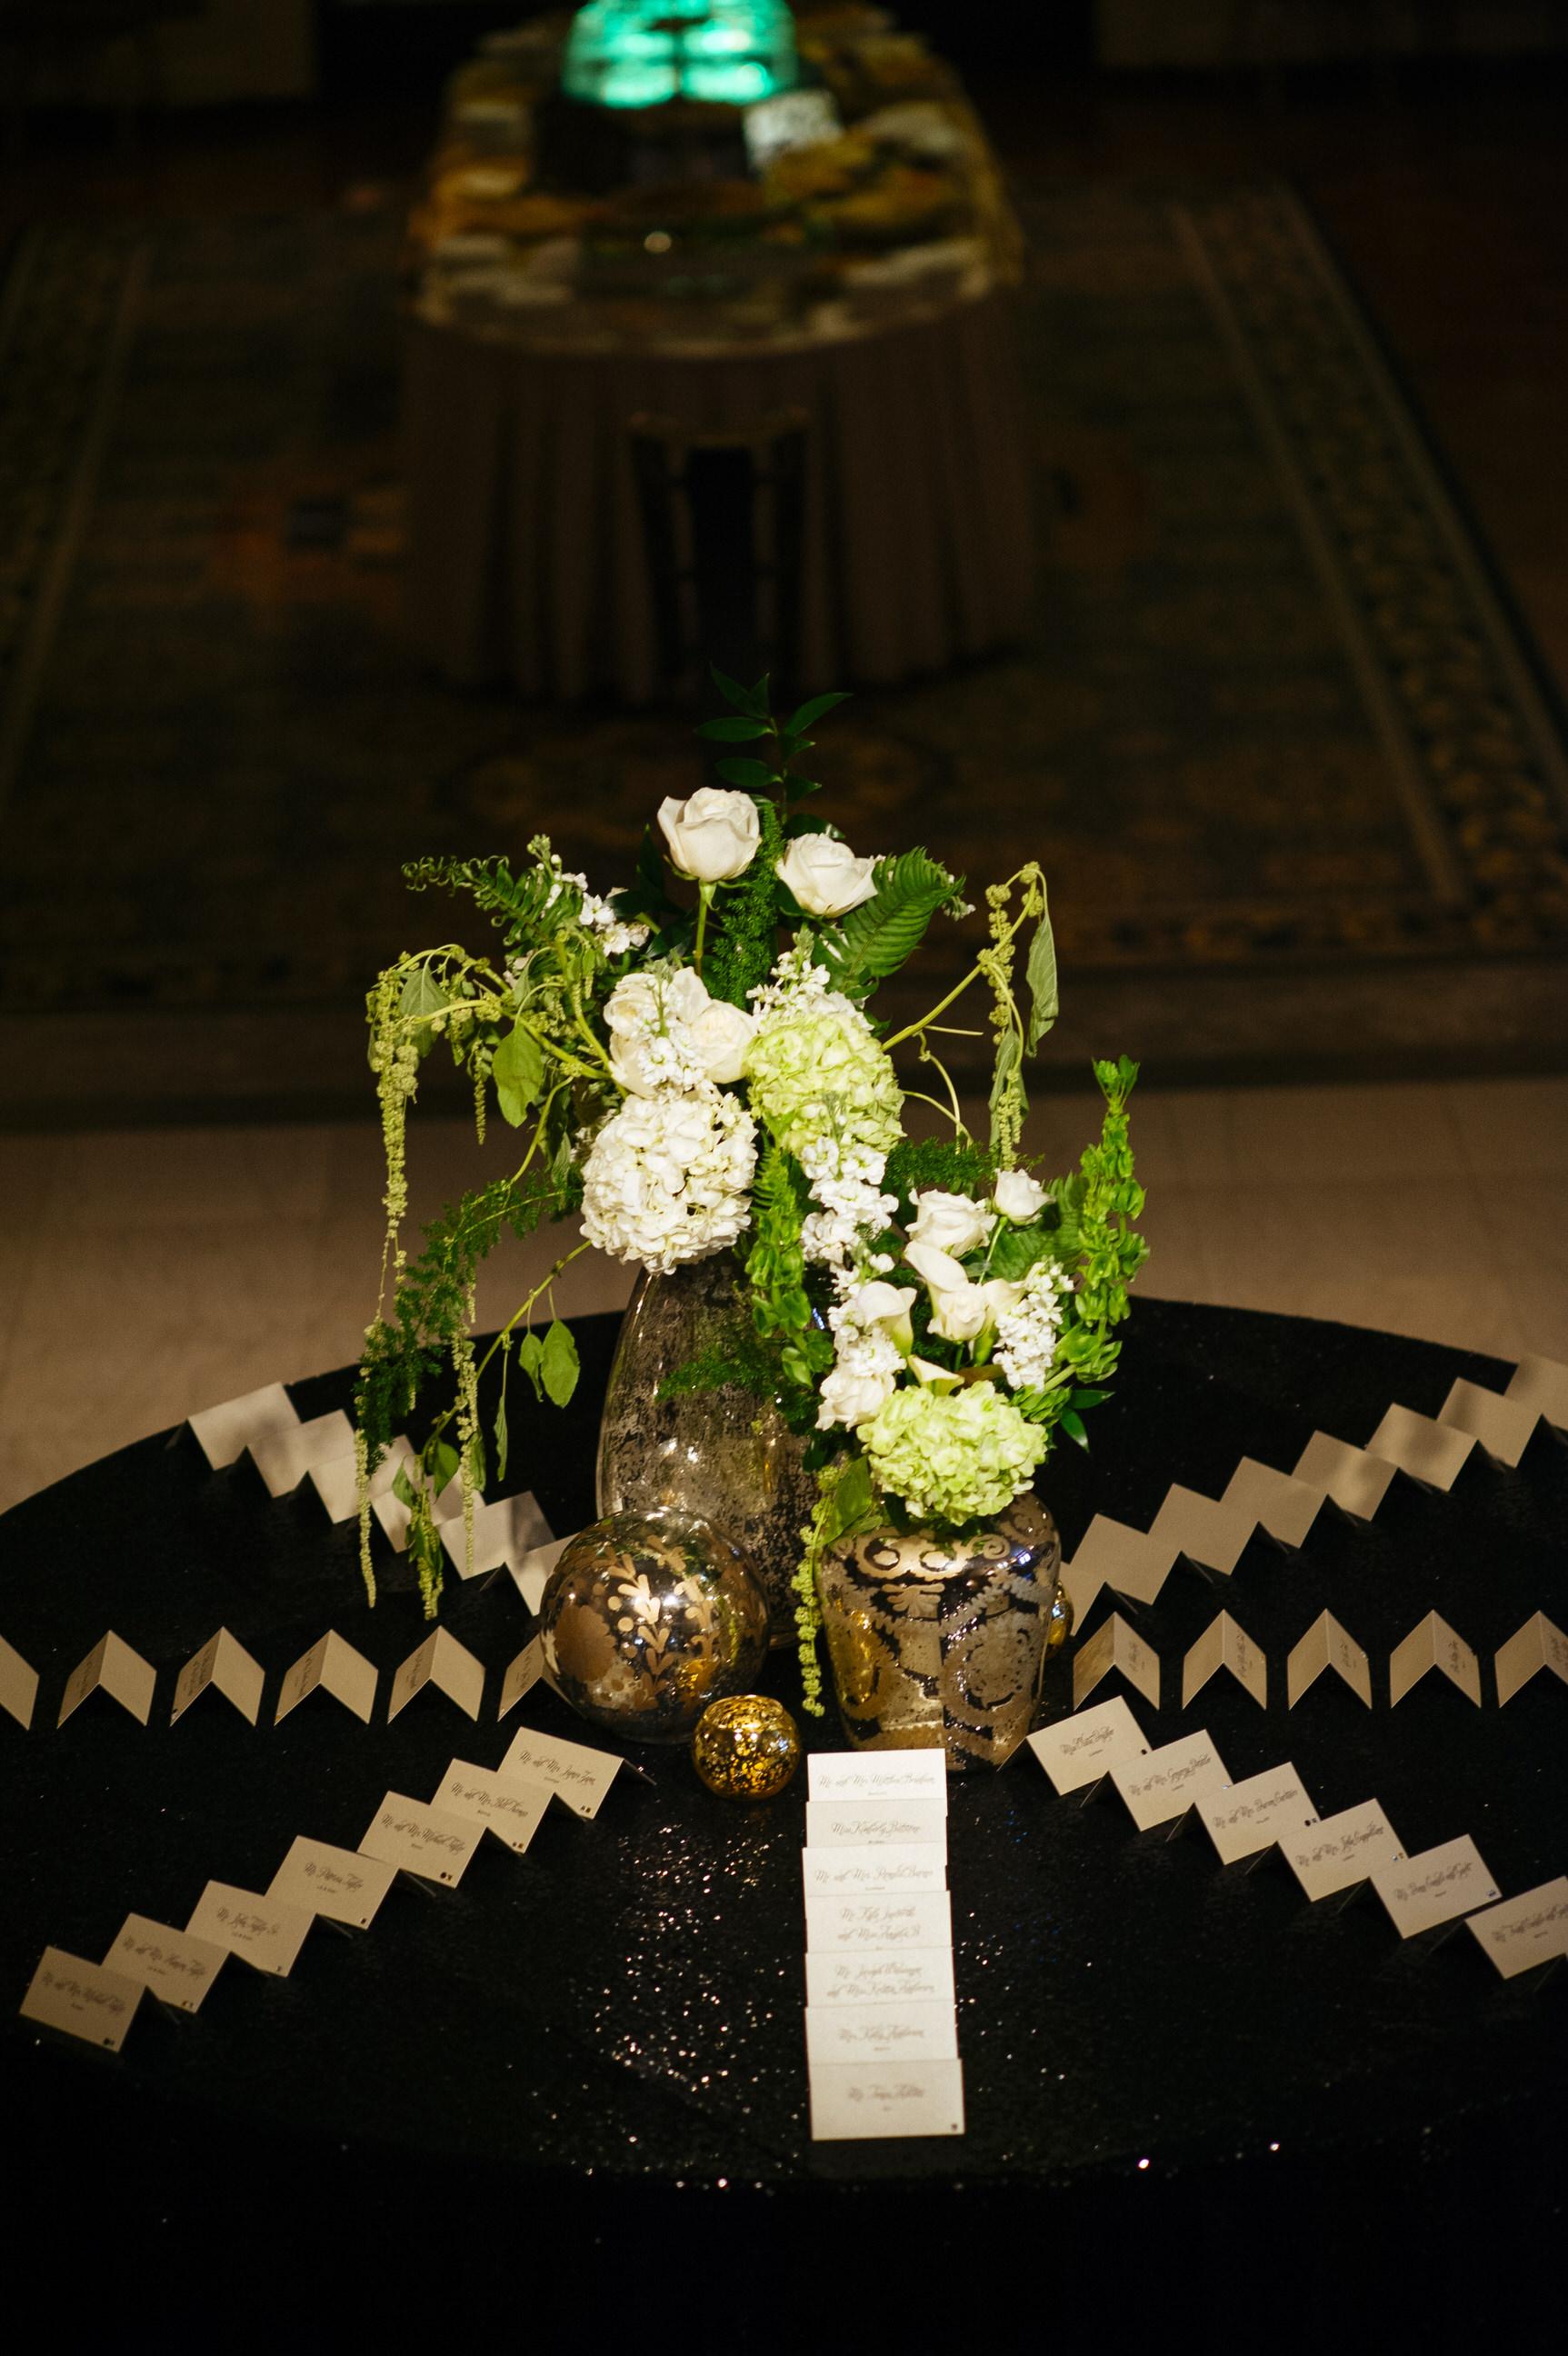 23 Hotel DuPont Wedding Escort Card White Hydrangea Green Amaranthus.jpg